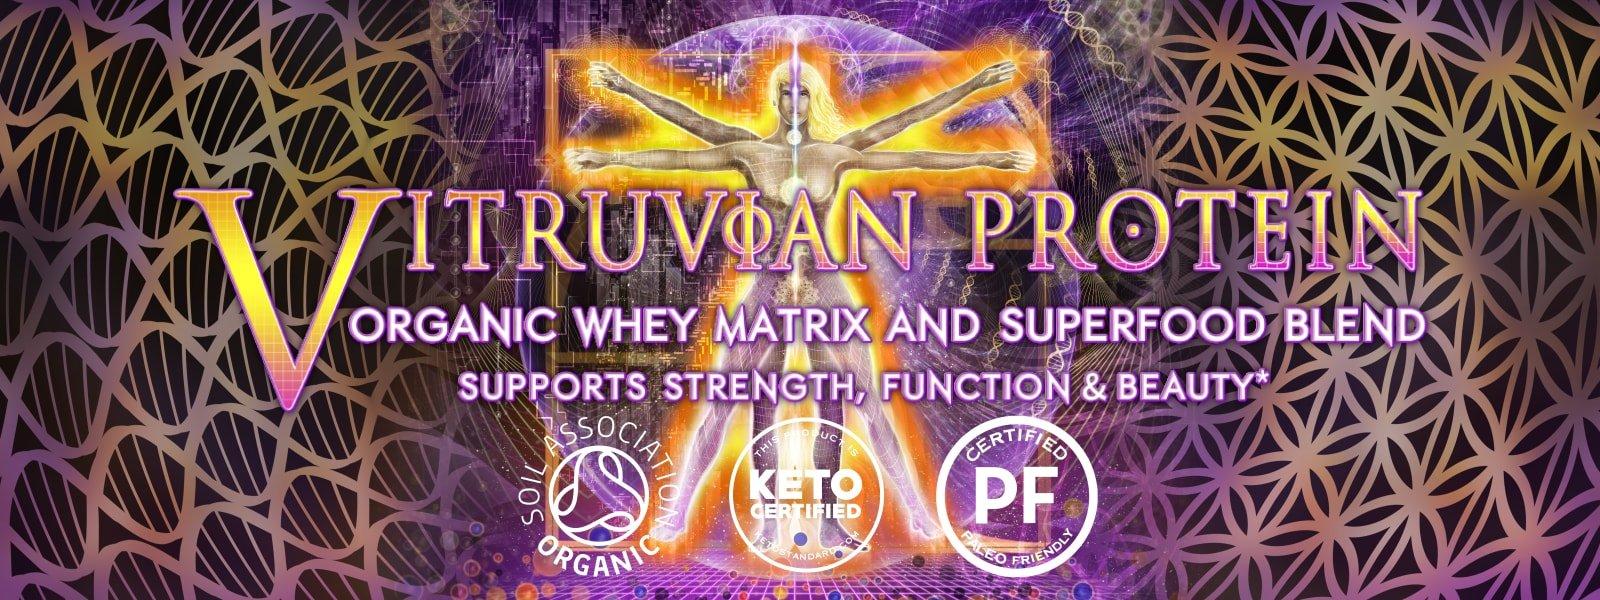 vitruvian protein artwork vitruvian man dna flower of life organic paleo friendly keto logos